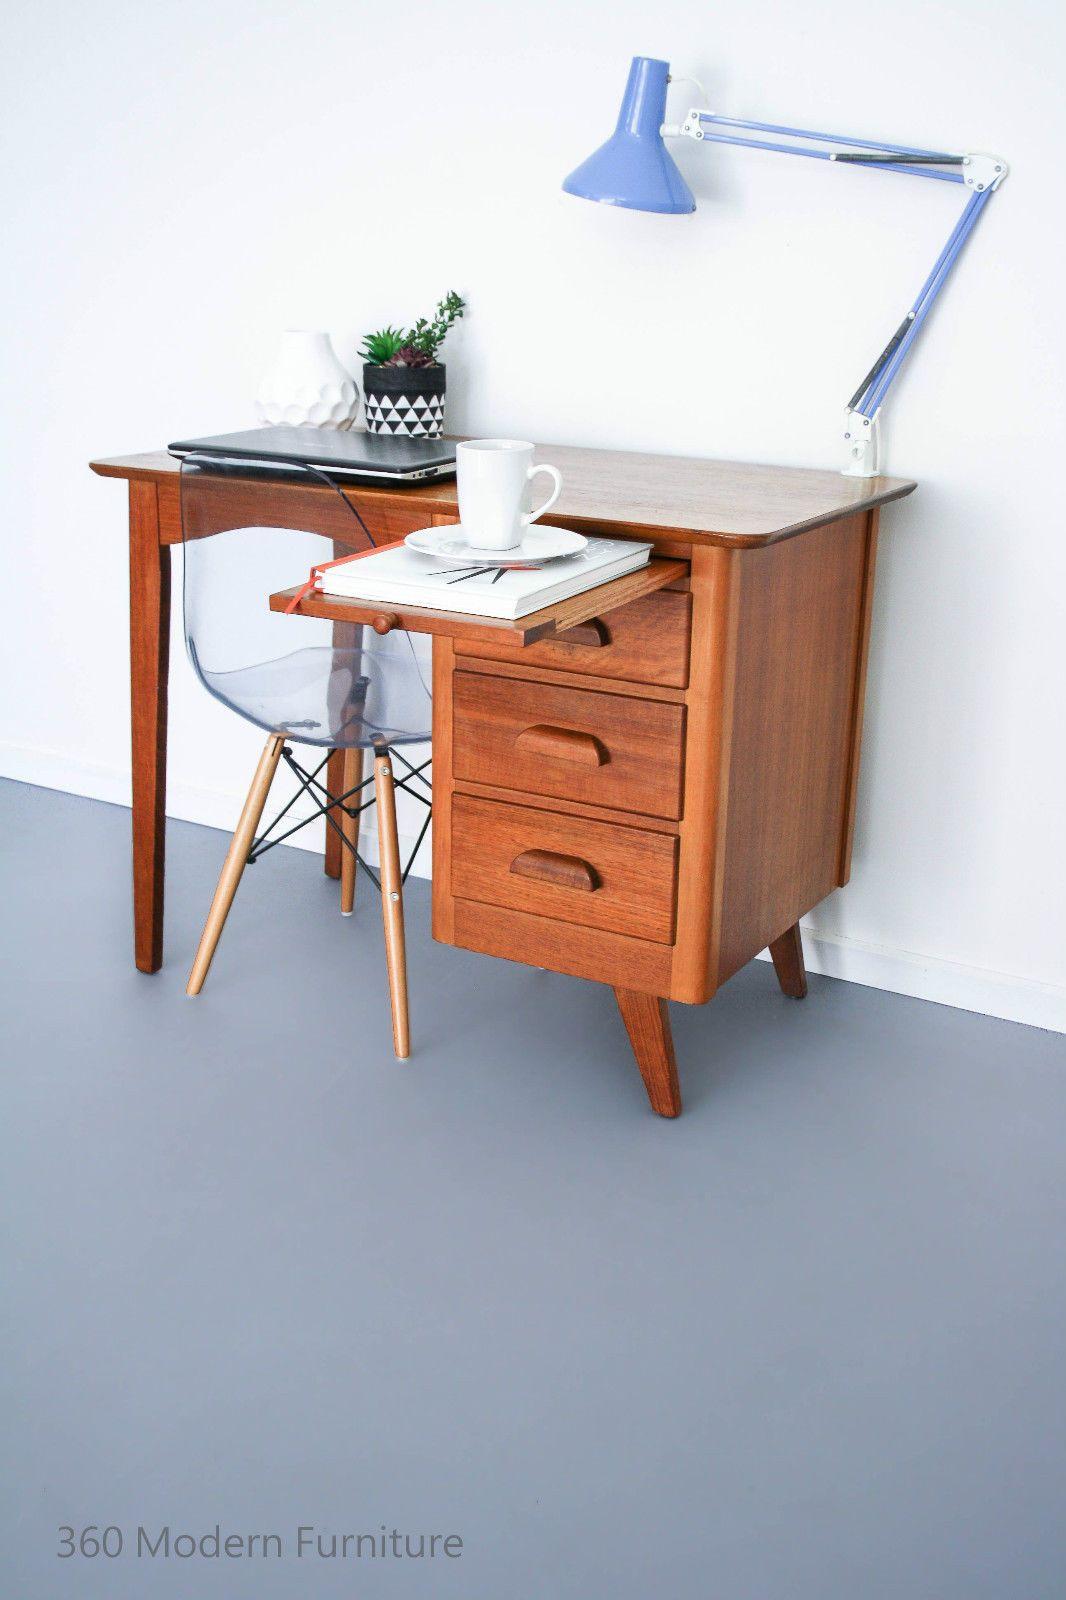 Mid century industrial desk orig modern table vintage retro scandi room divider in home garden furniture desks home office furniture ebay 360 modern